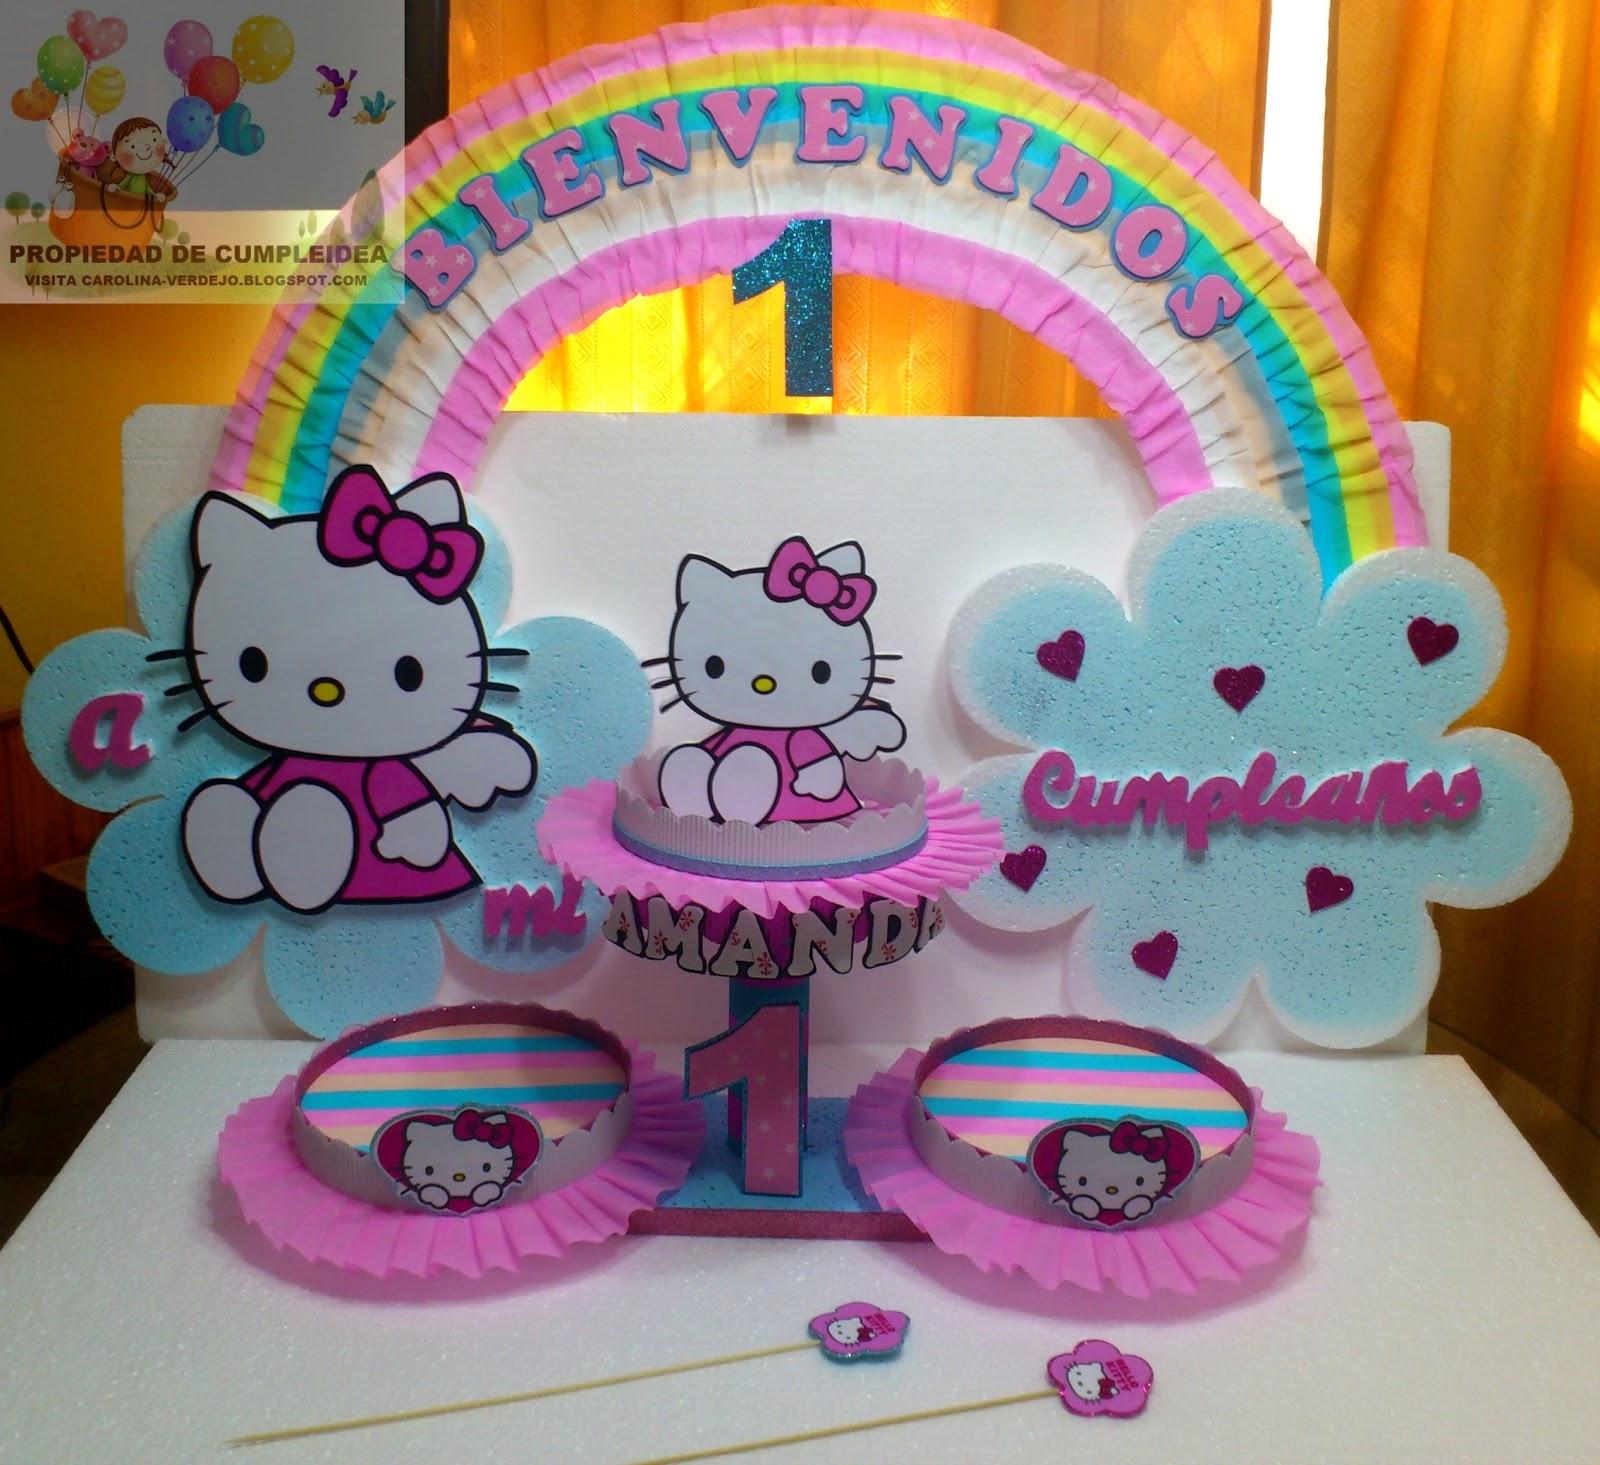 Decoraciones infantiles hello kitty - Decoracion hello kitty ...